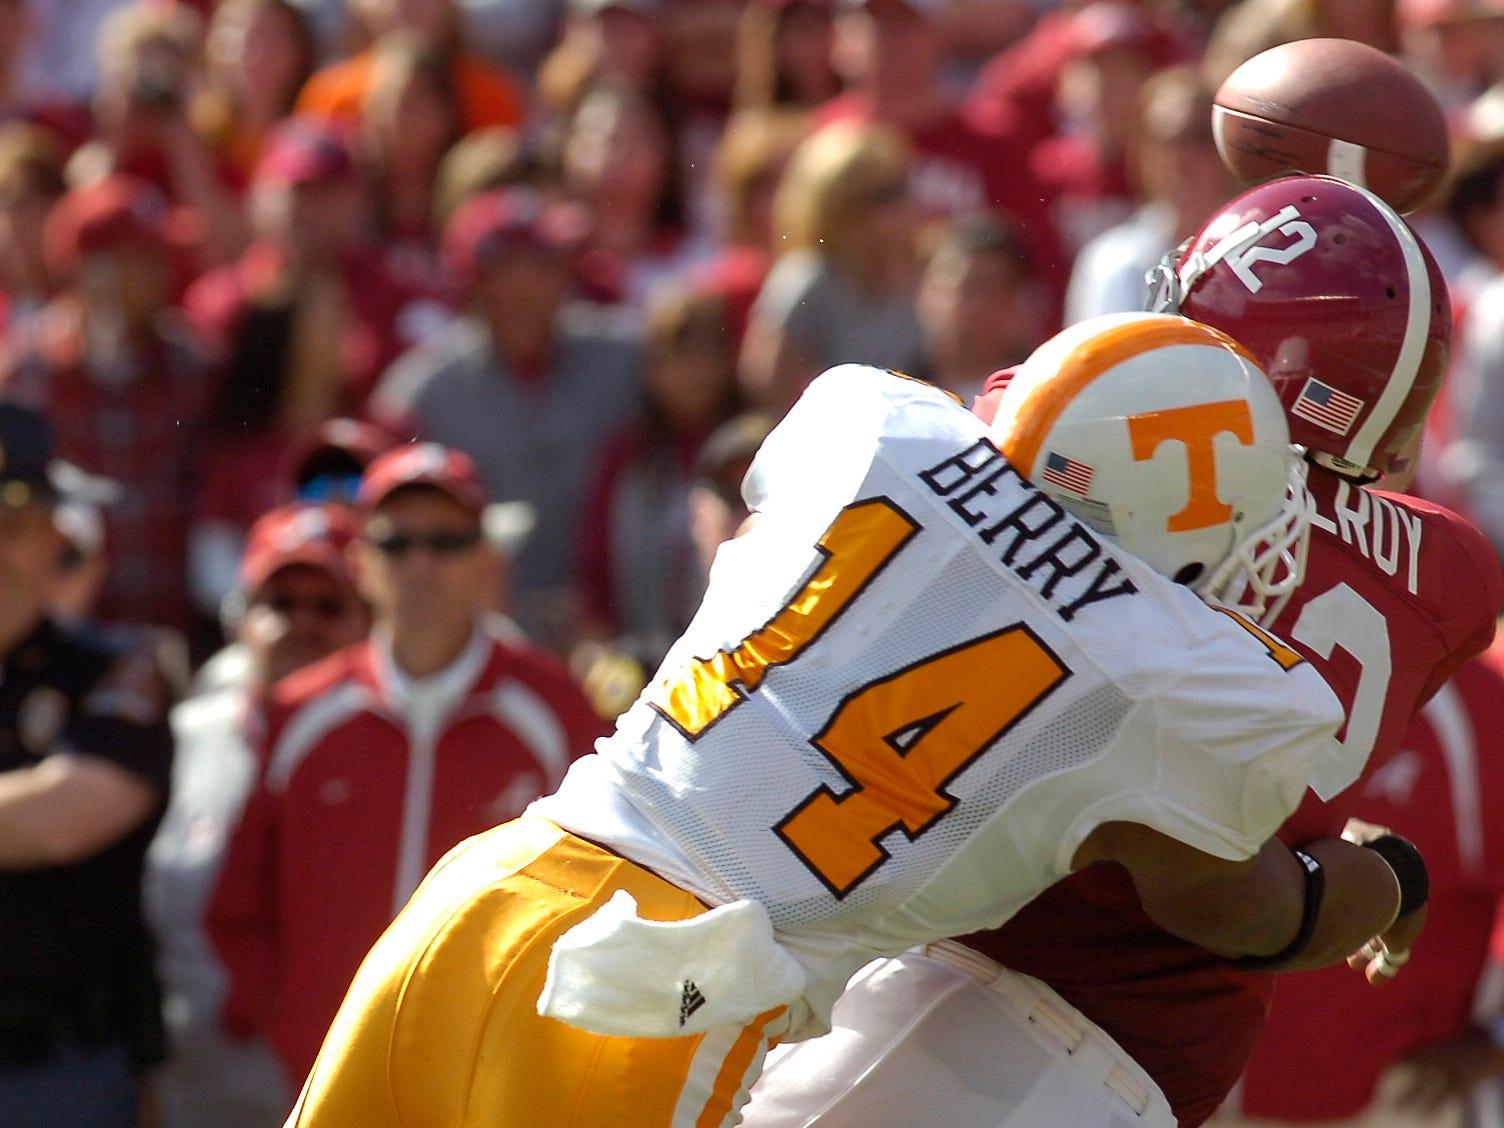 Tennessee's Eric Berry sacks Alabama quarterback Greg McElroy at Bryant Denny Stadium in Tuscaloosa on Saturday, Oct. 224, 2009.